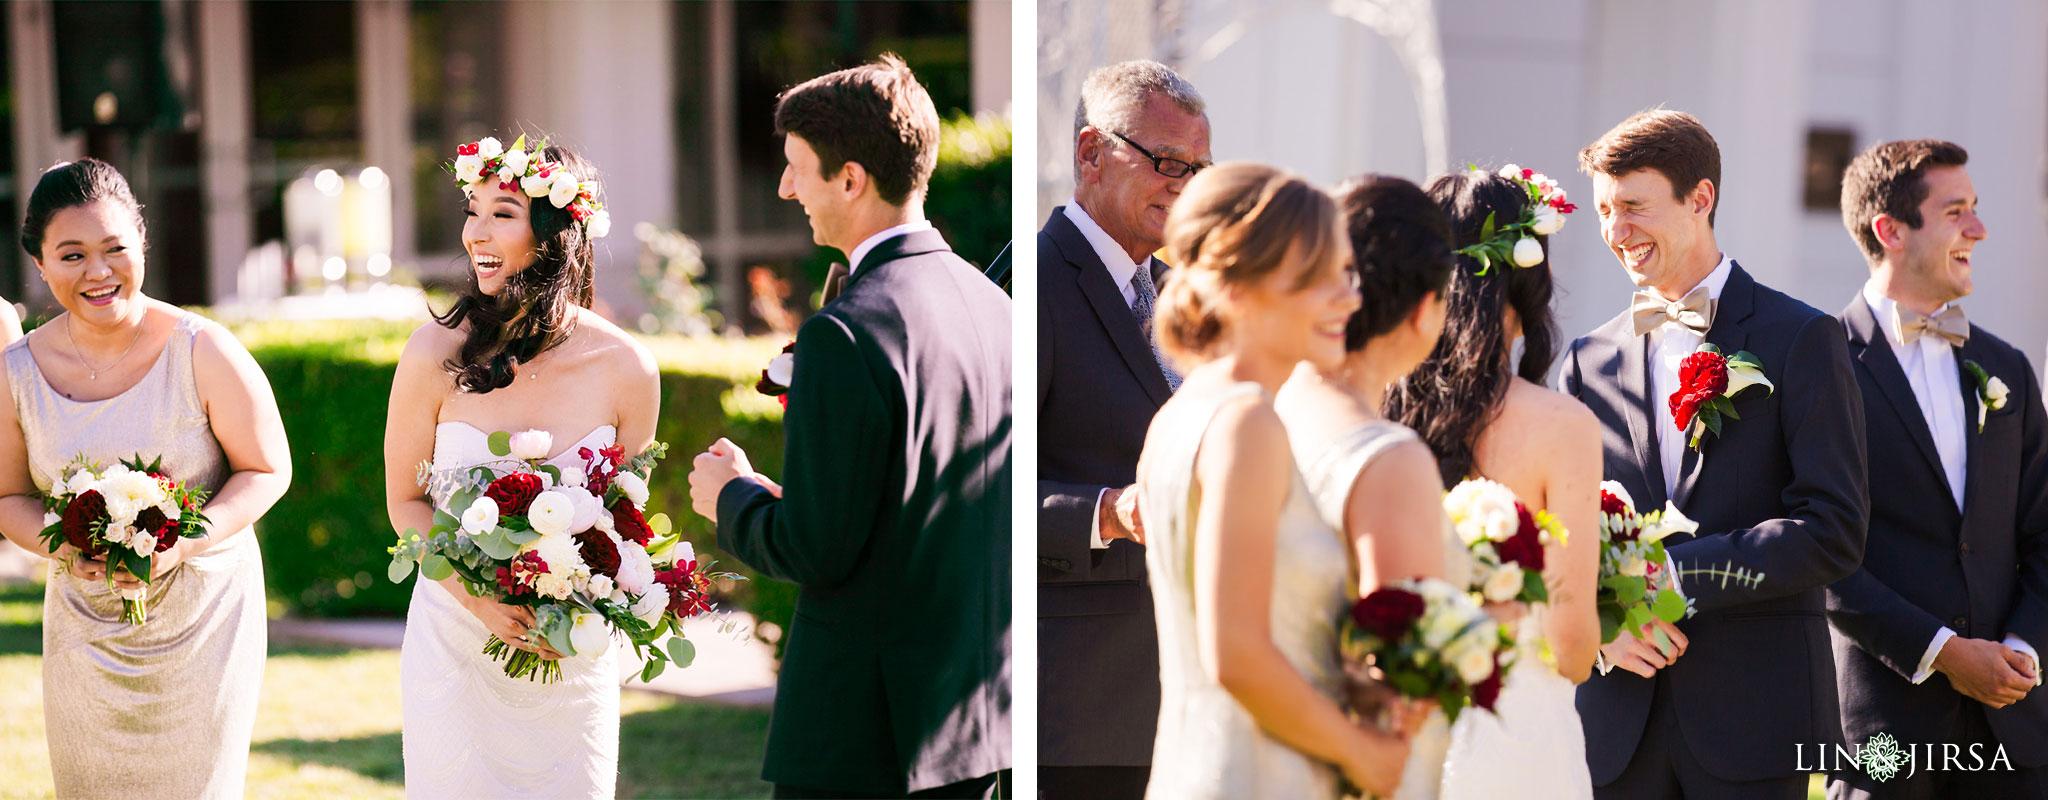 021 richard nixon library wedding ceremony photography 1